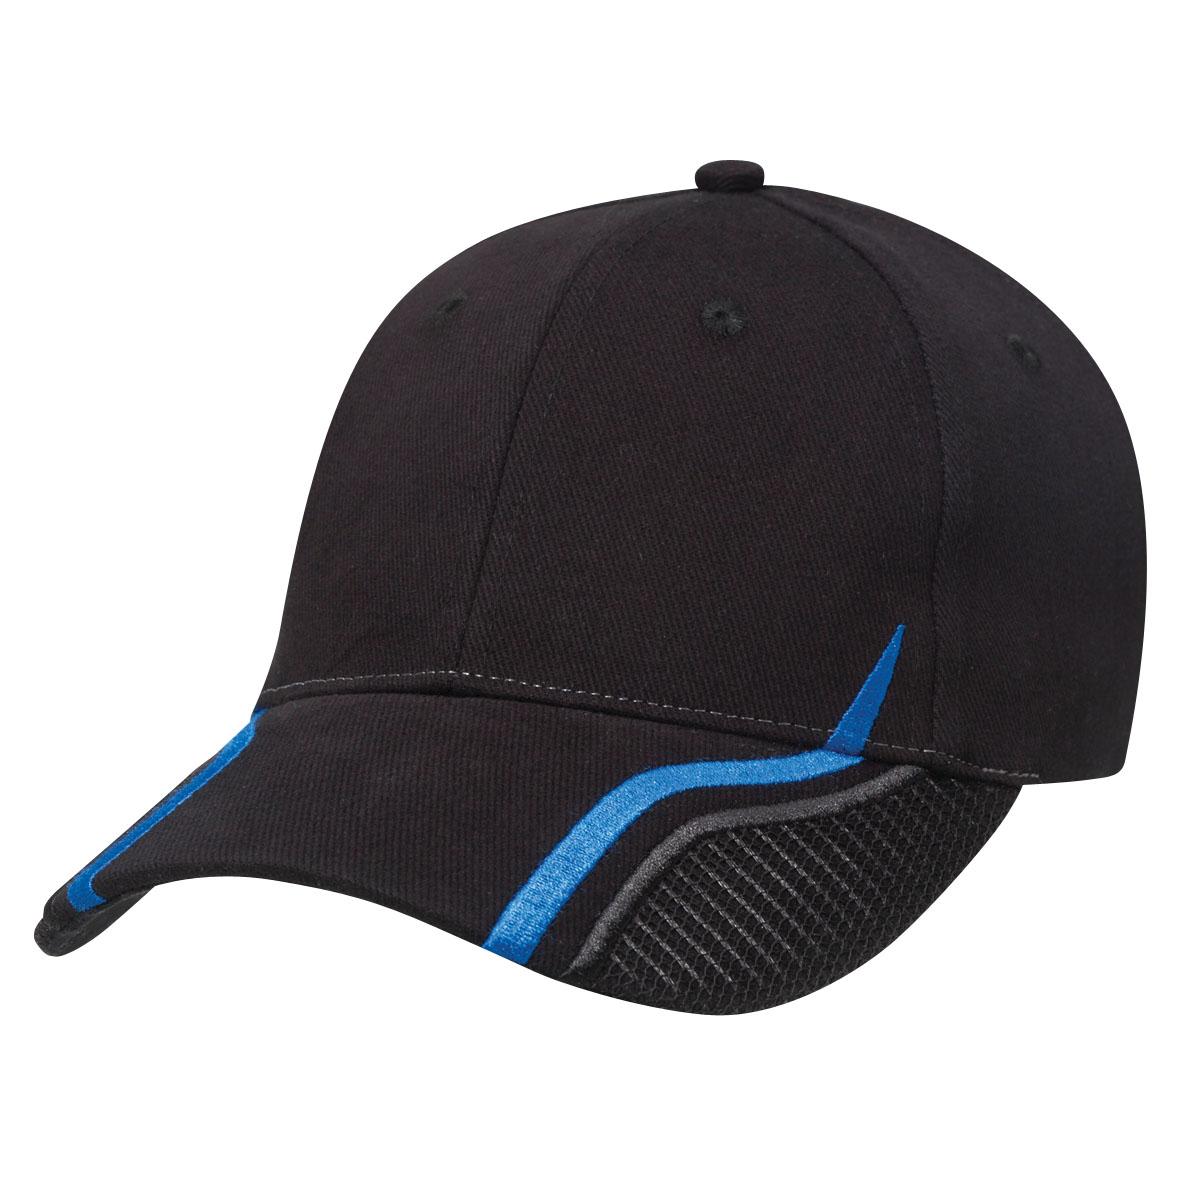 Downforce Cap